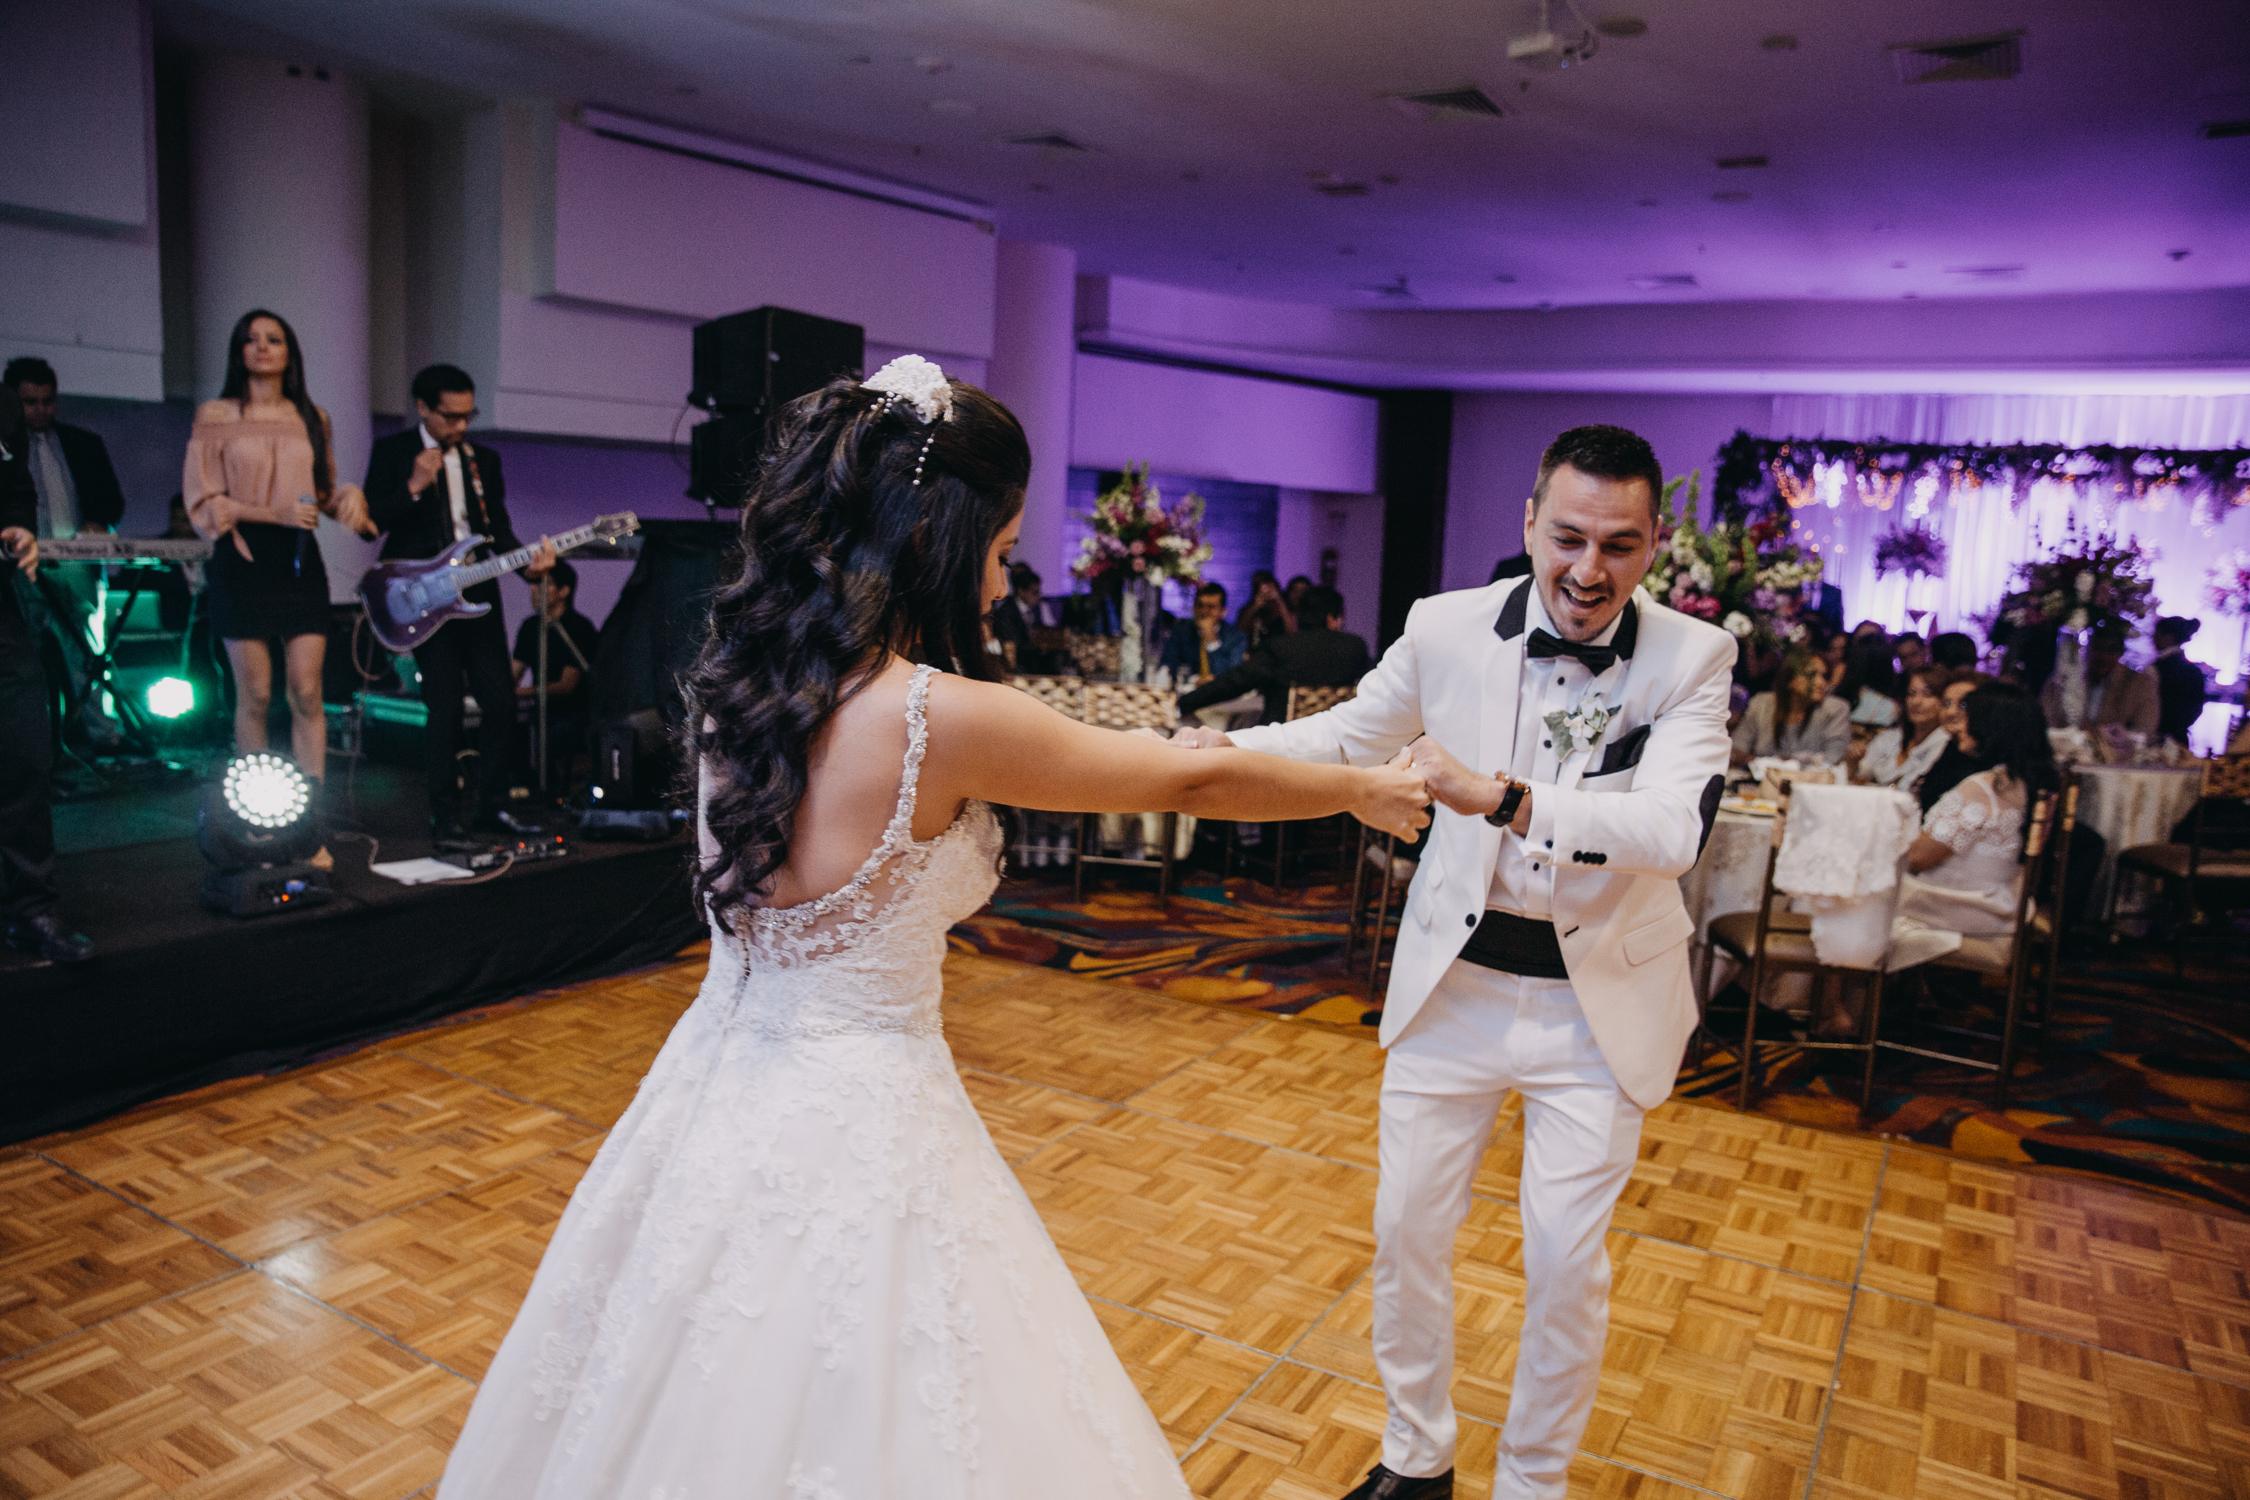 Michelle-Agurto-Fotografia-Bodas-Ecuador-Destination-Wedding-Photographer-Daniela-Dirk-66.JPG